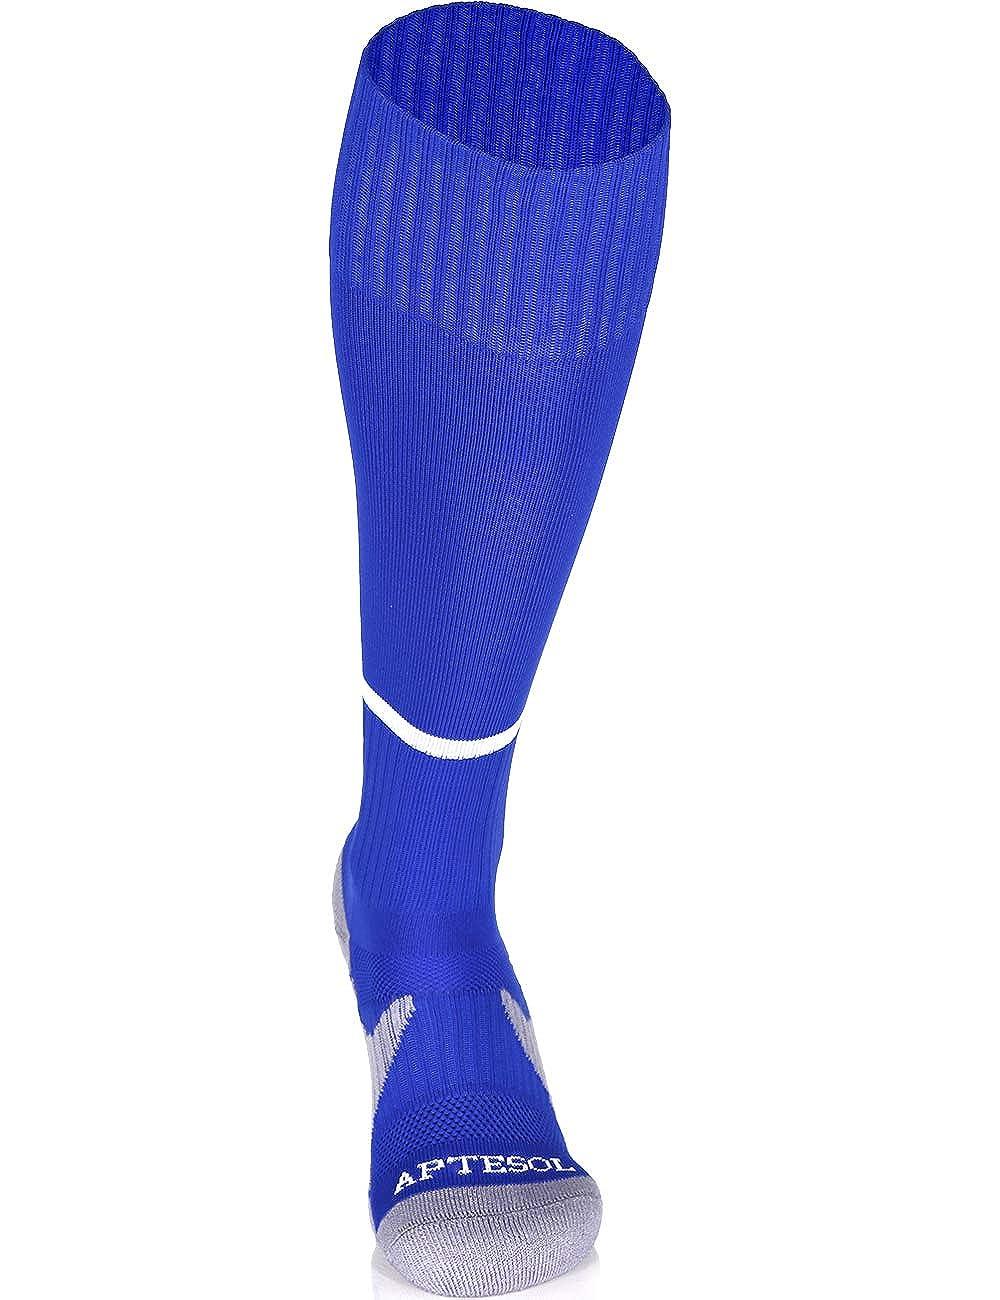 APTESOL Knee High Soccer Socks Compression Kids Adult Youth Team Sport Socks